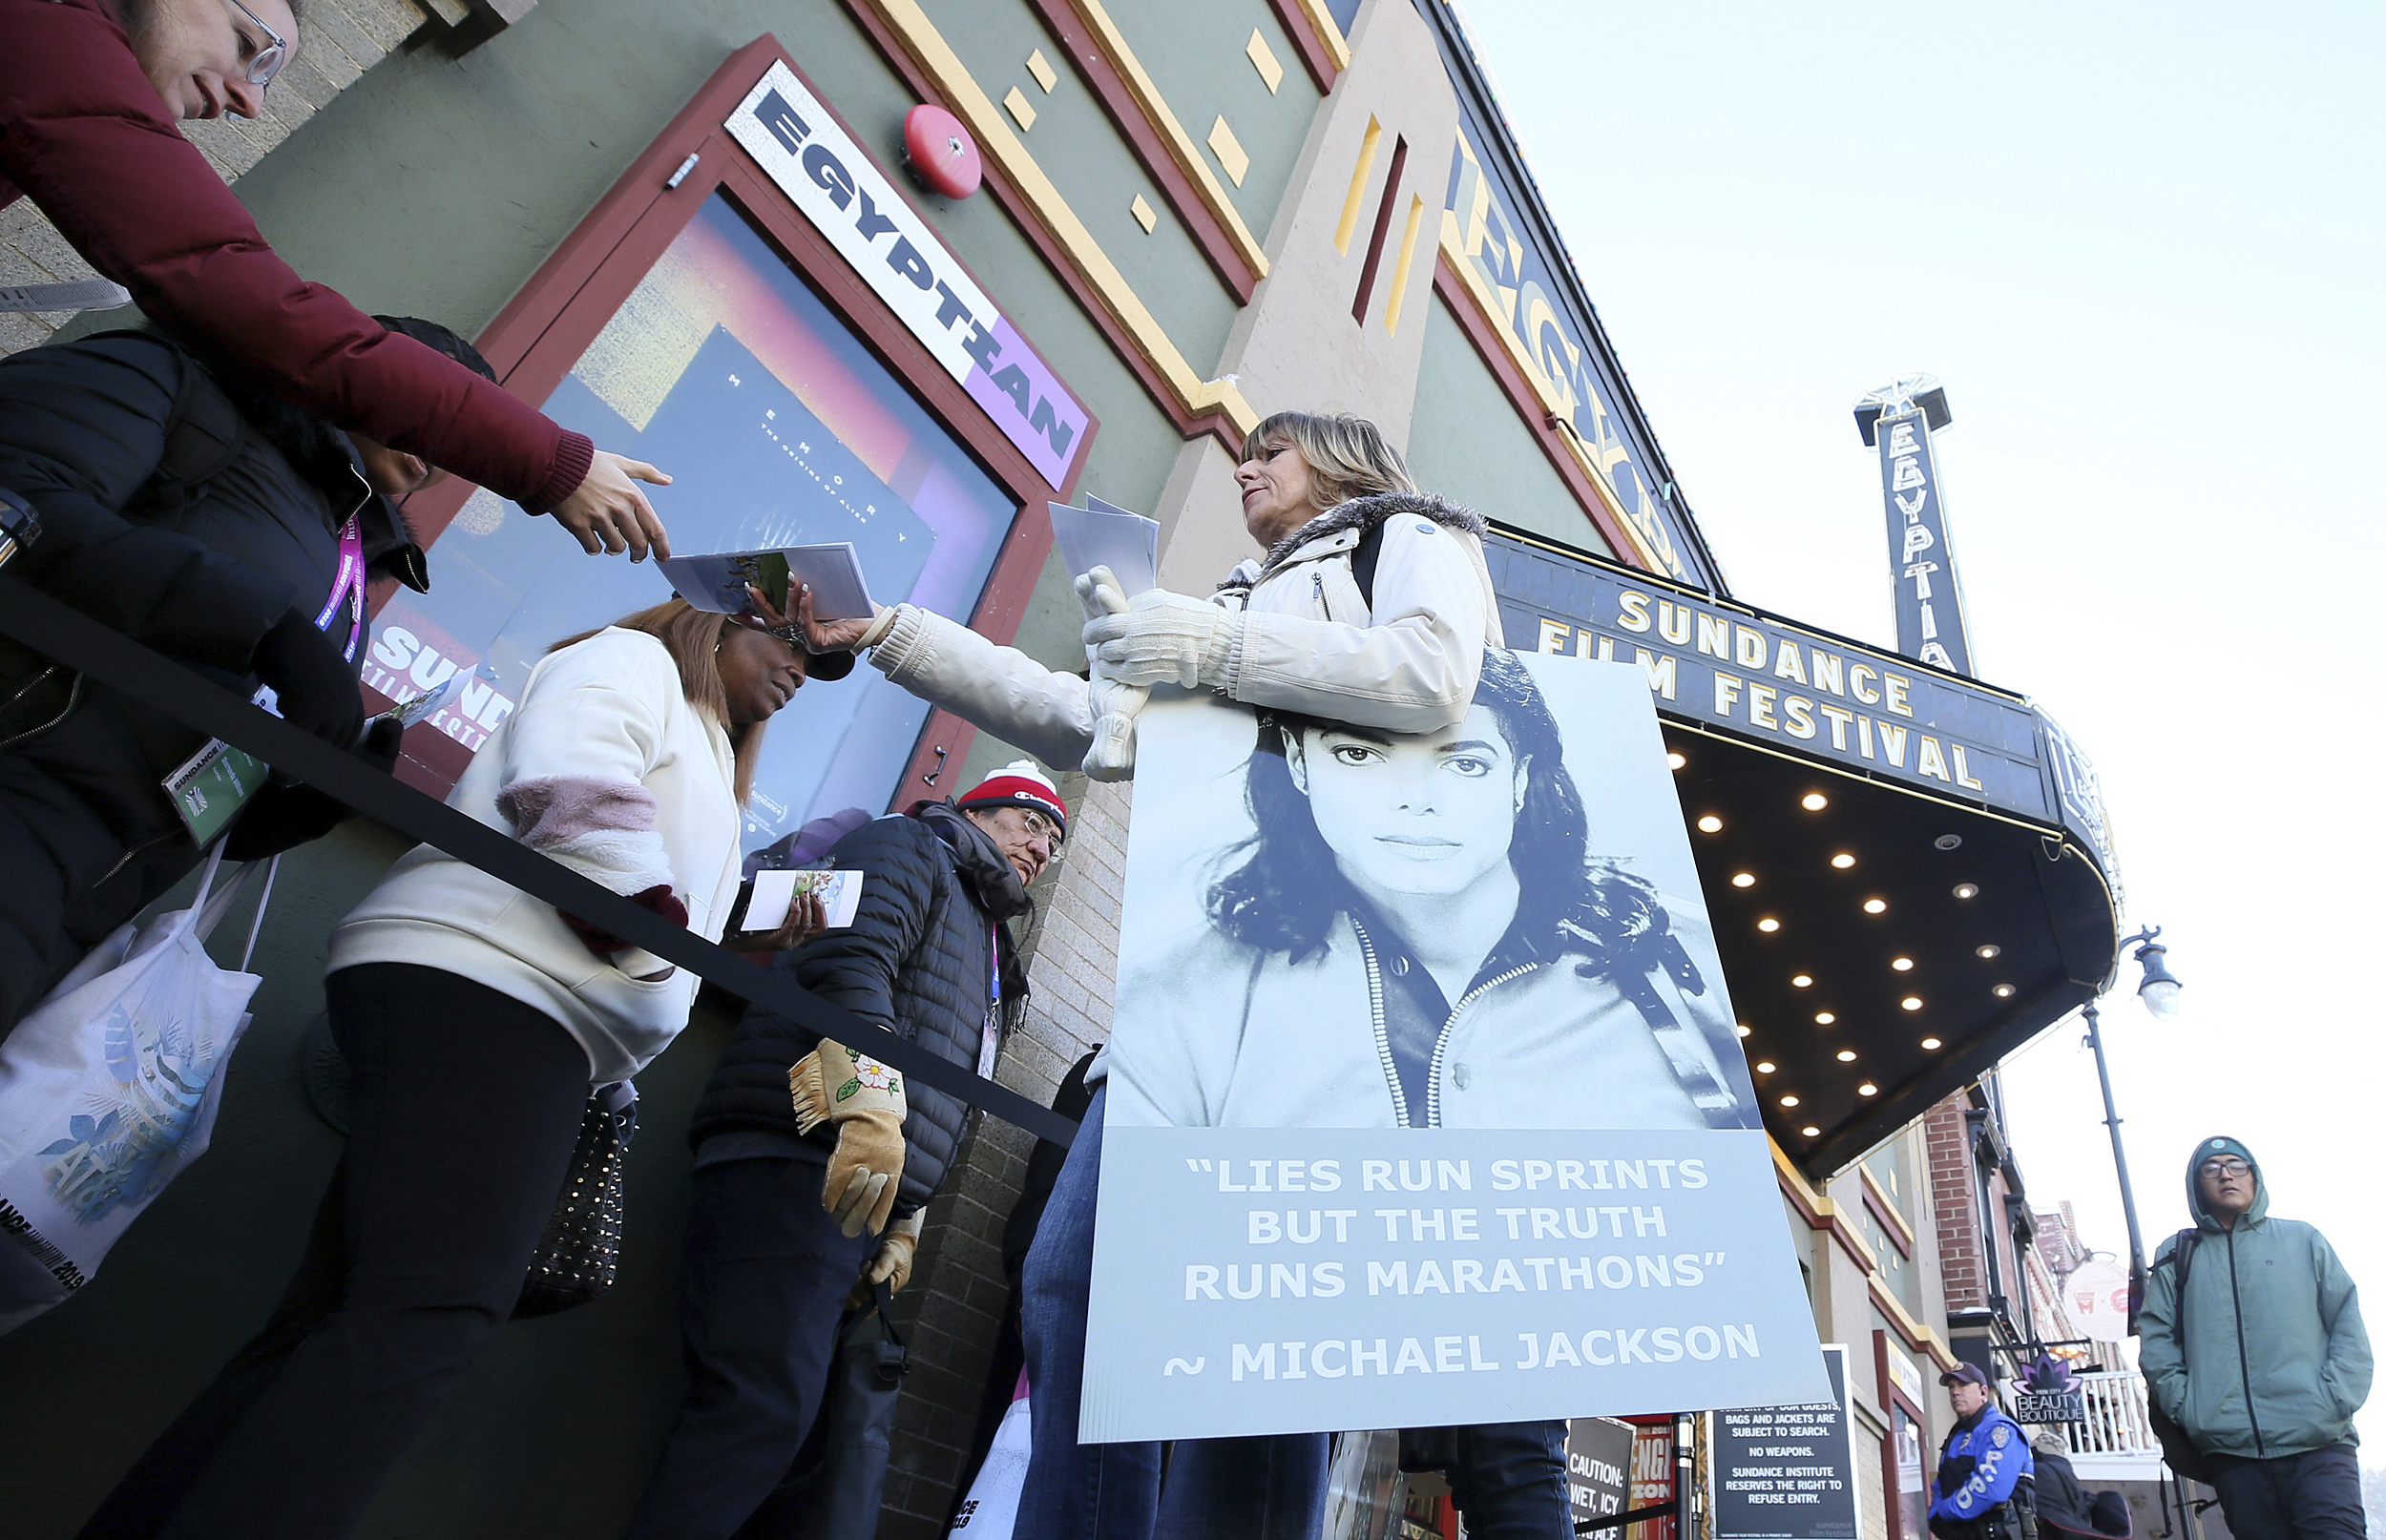 ee63c820cb39 Michael Jackson accusers get solemn ovation at Sundance festival